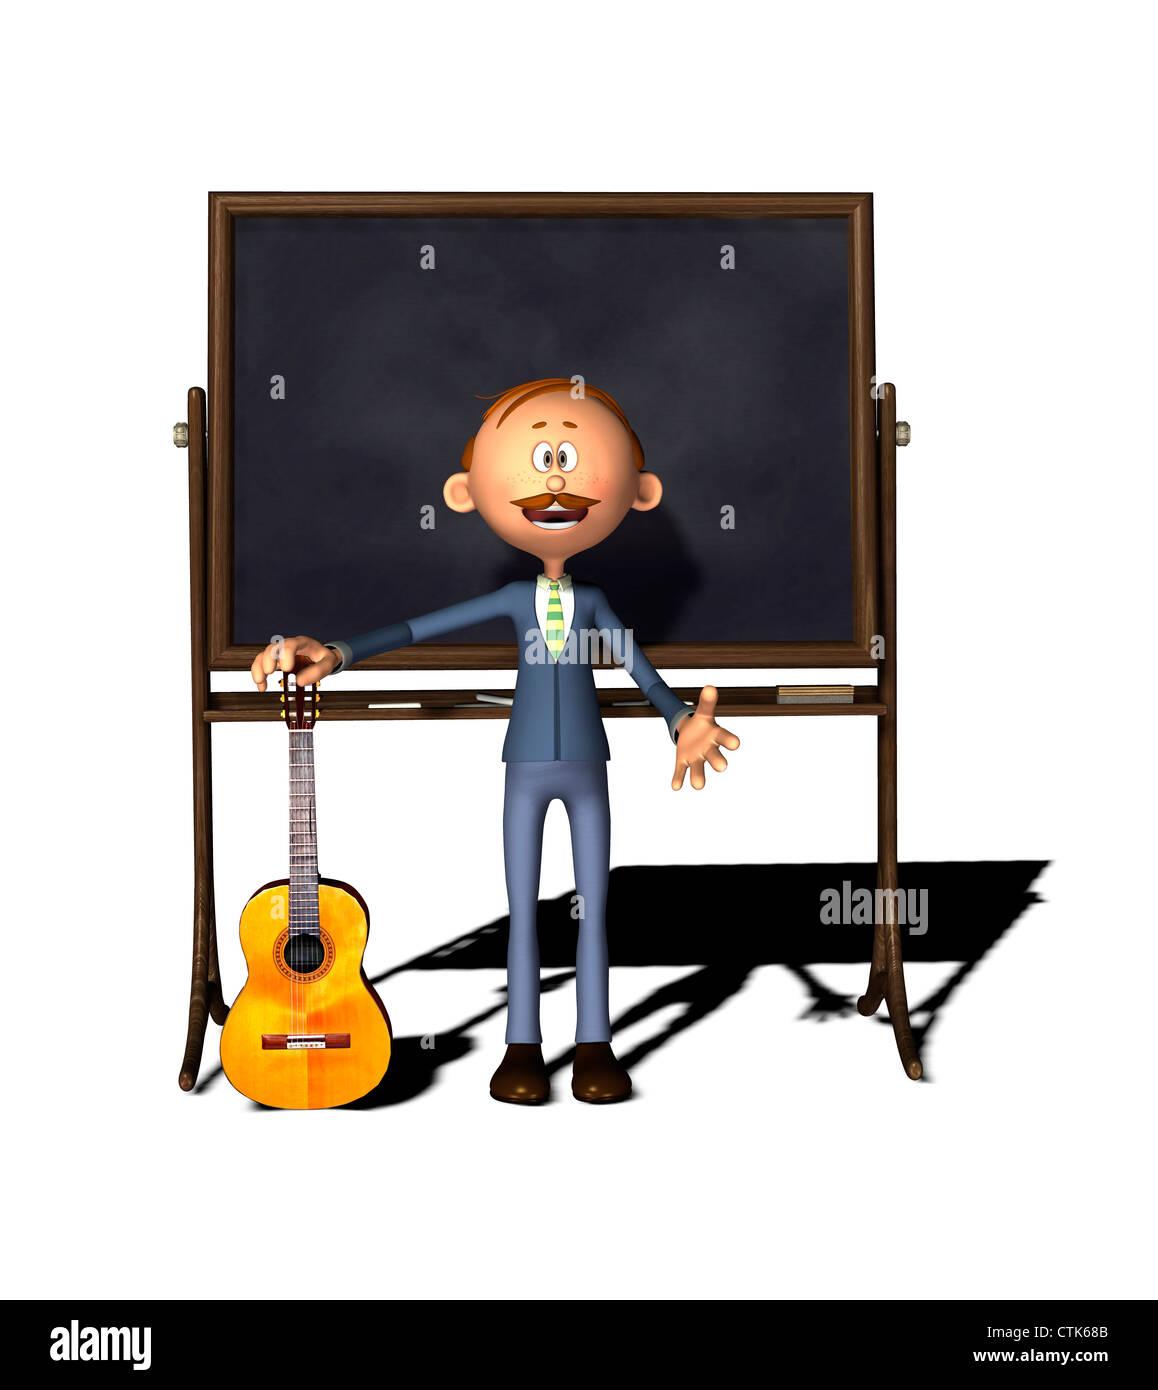 cartoon figure teacher with board and guitar Stock Photo